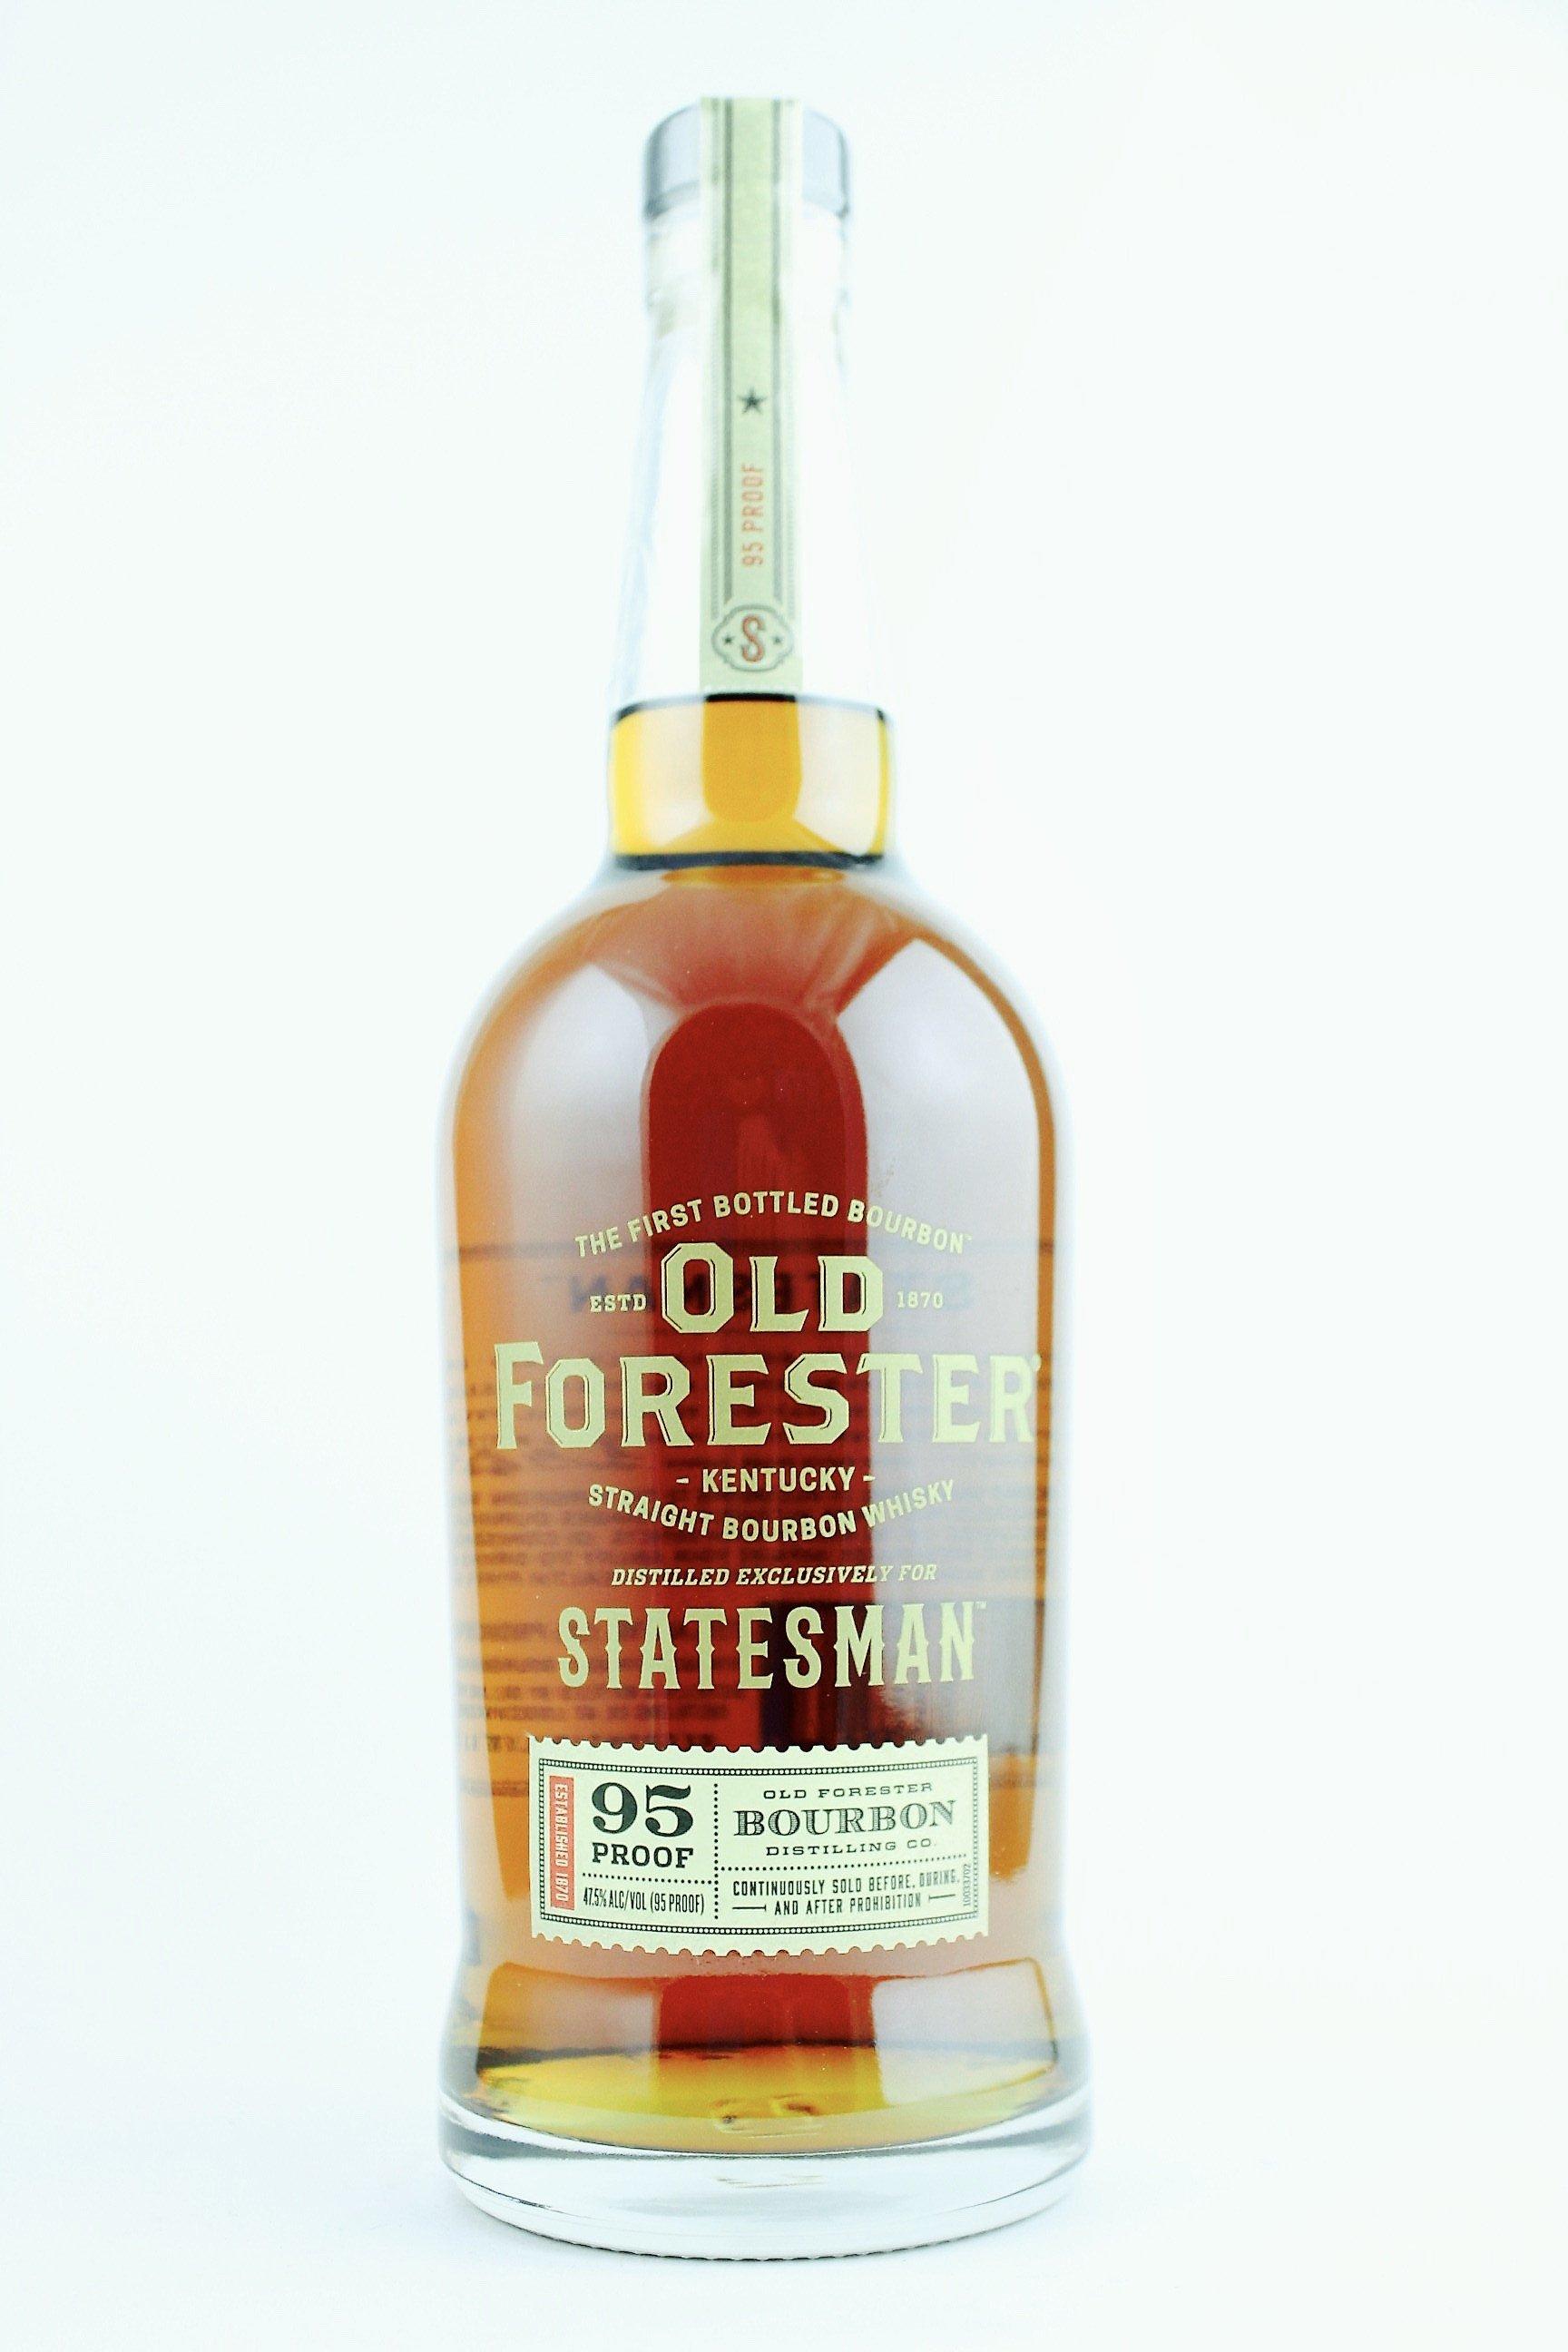 Old Forester Statesman Kentucky Straight Bourbon Whiskey 750 mL – Mora's Fine wine and spirits